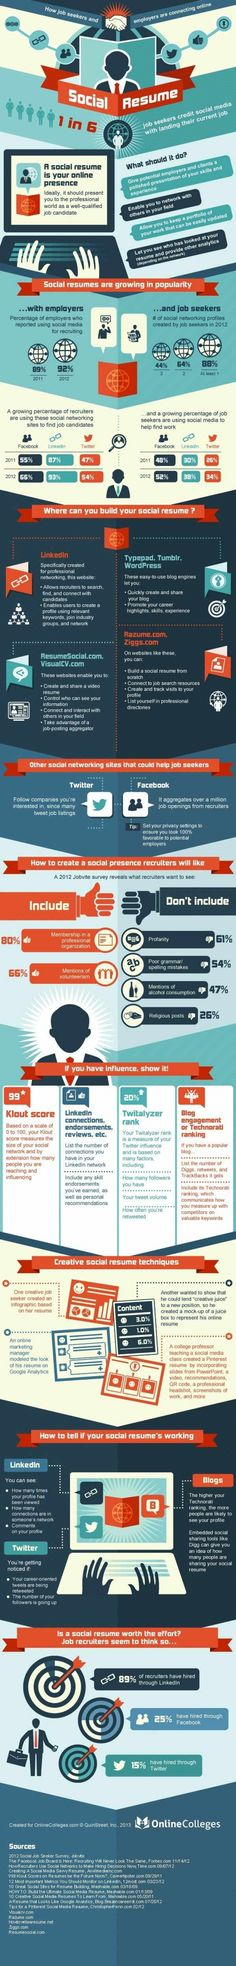 Infografik Social Recruiting Lebenslauf Online und Offline | #employerbranding repined by www.re-lounge.com